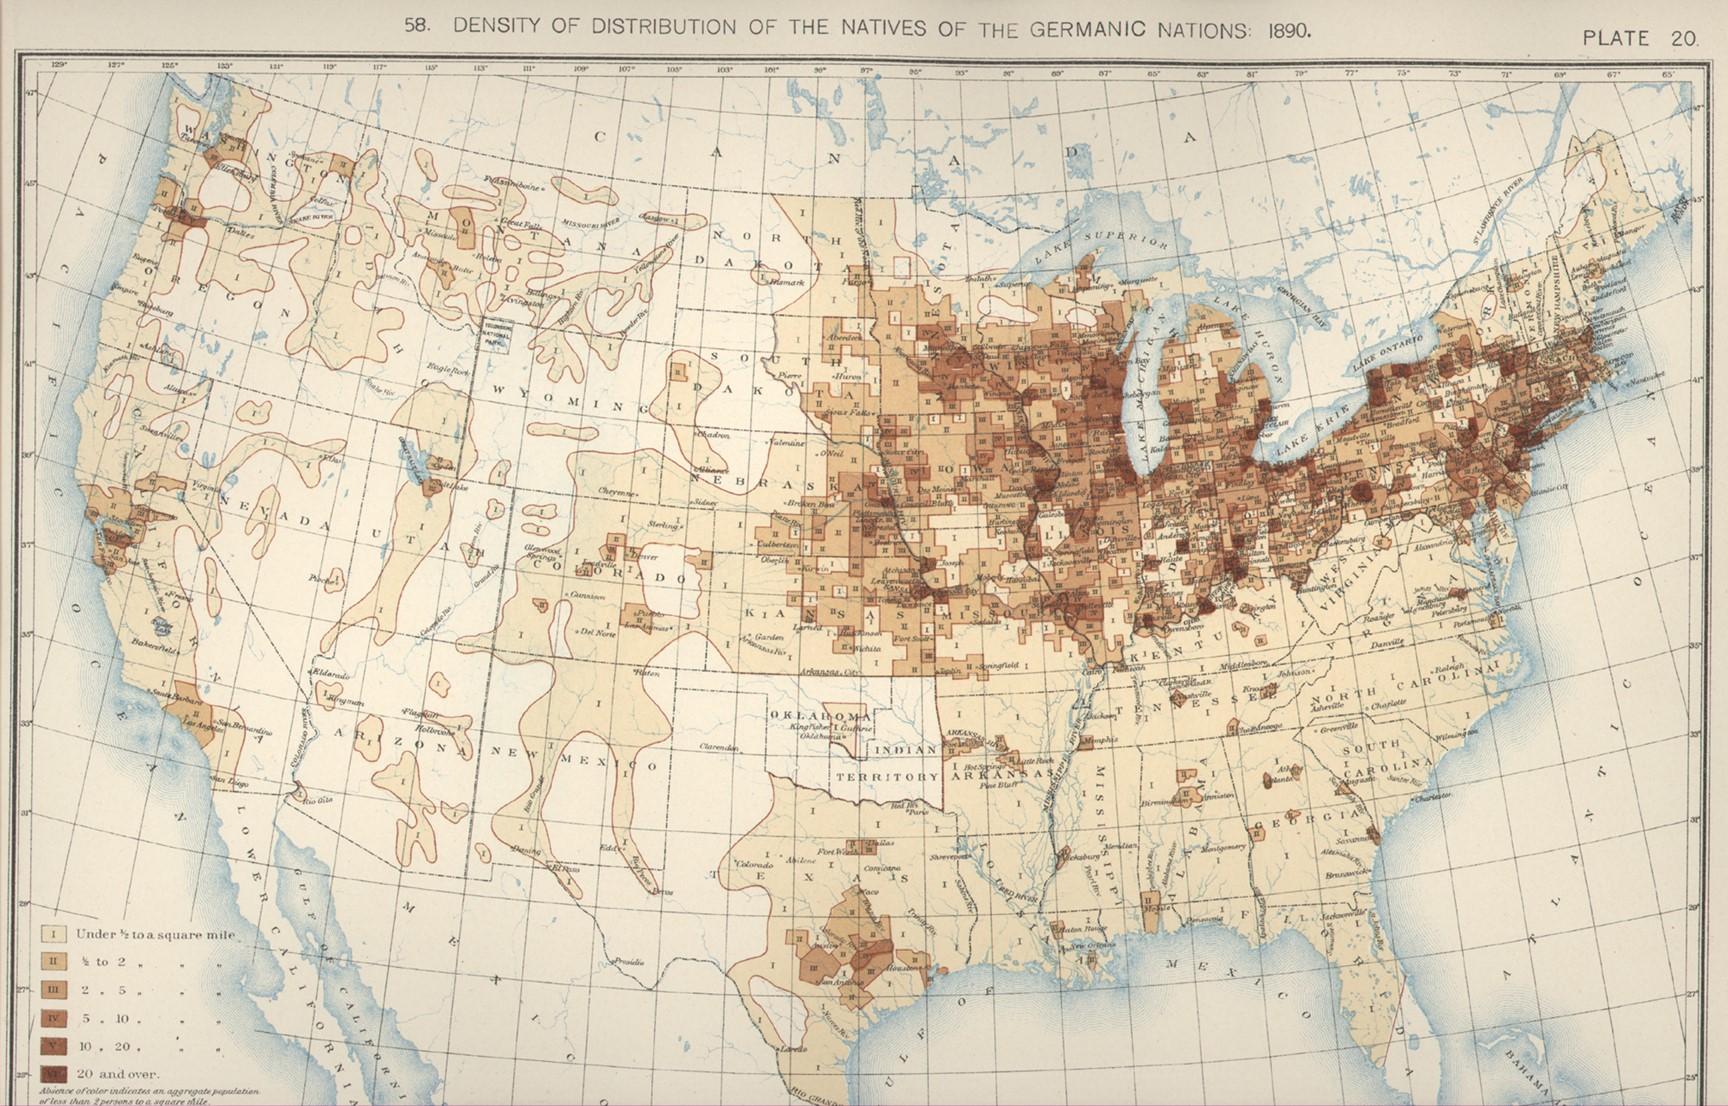 The Census Disease Maps